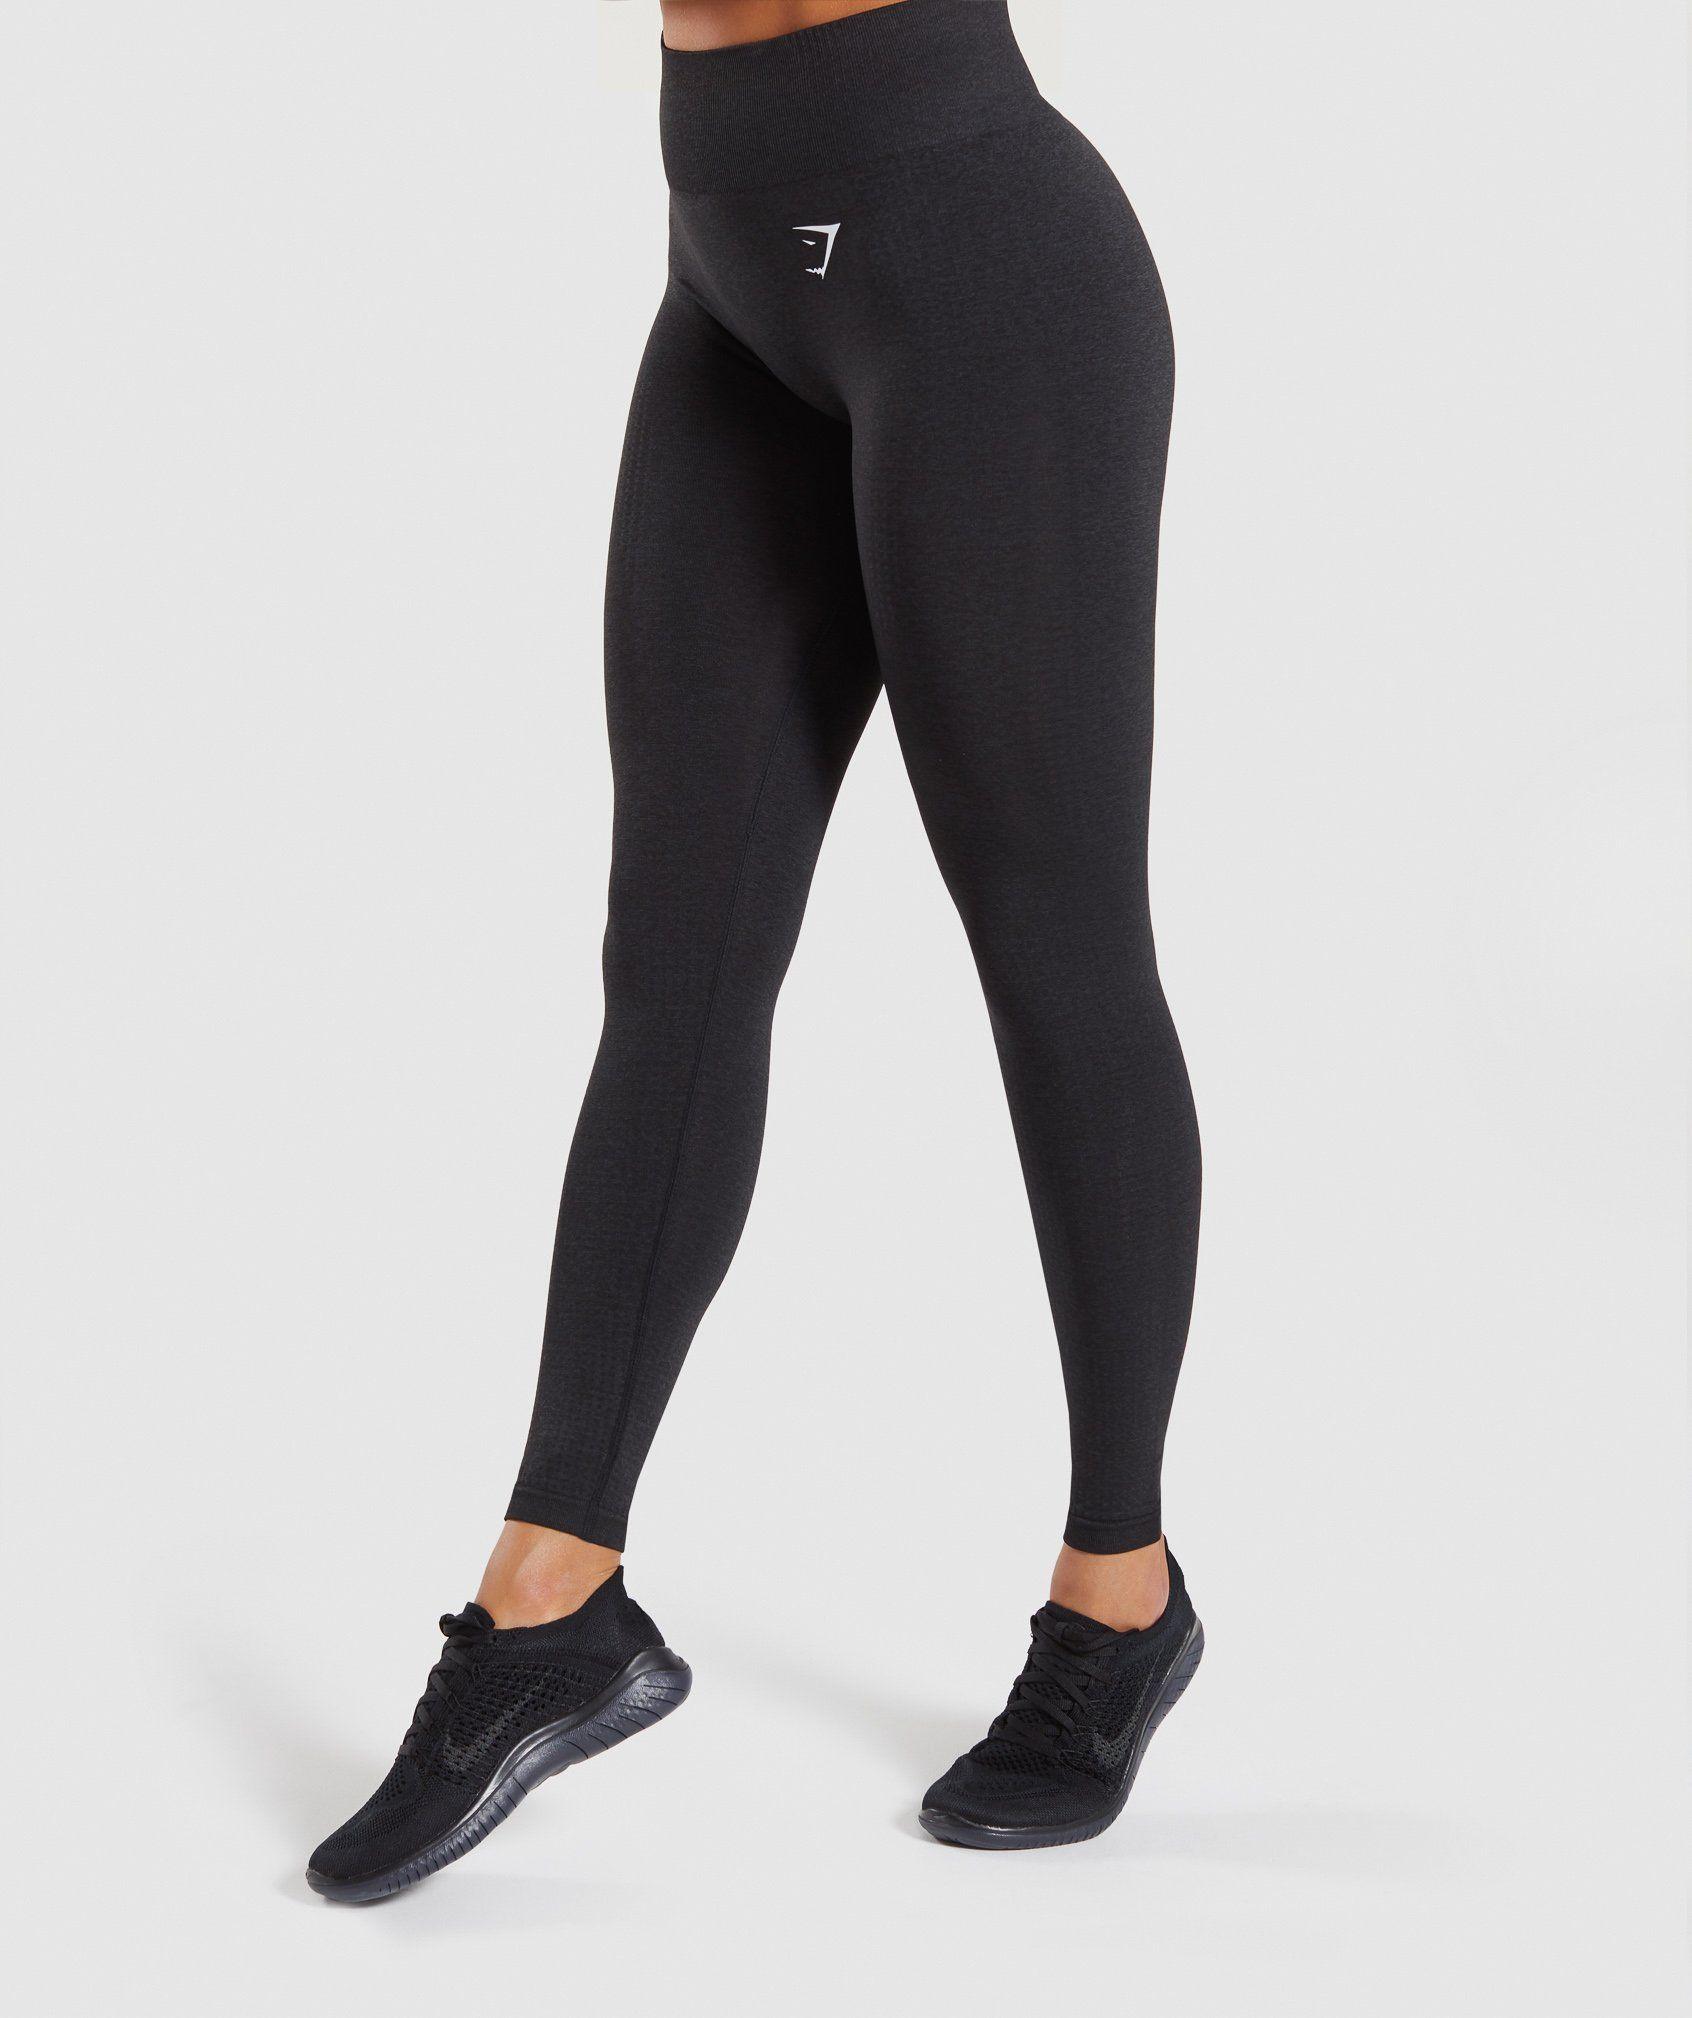 05180f7f8cb Gymshark Flex High Waisted Leggings - Charcoal Marl  Dusky Pink